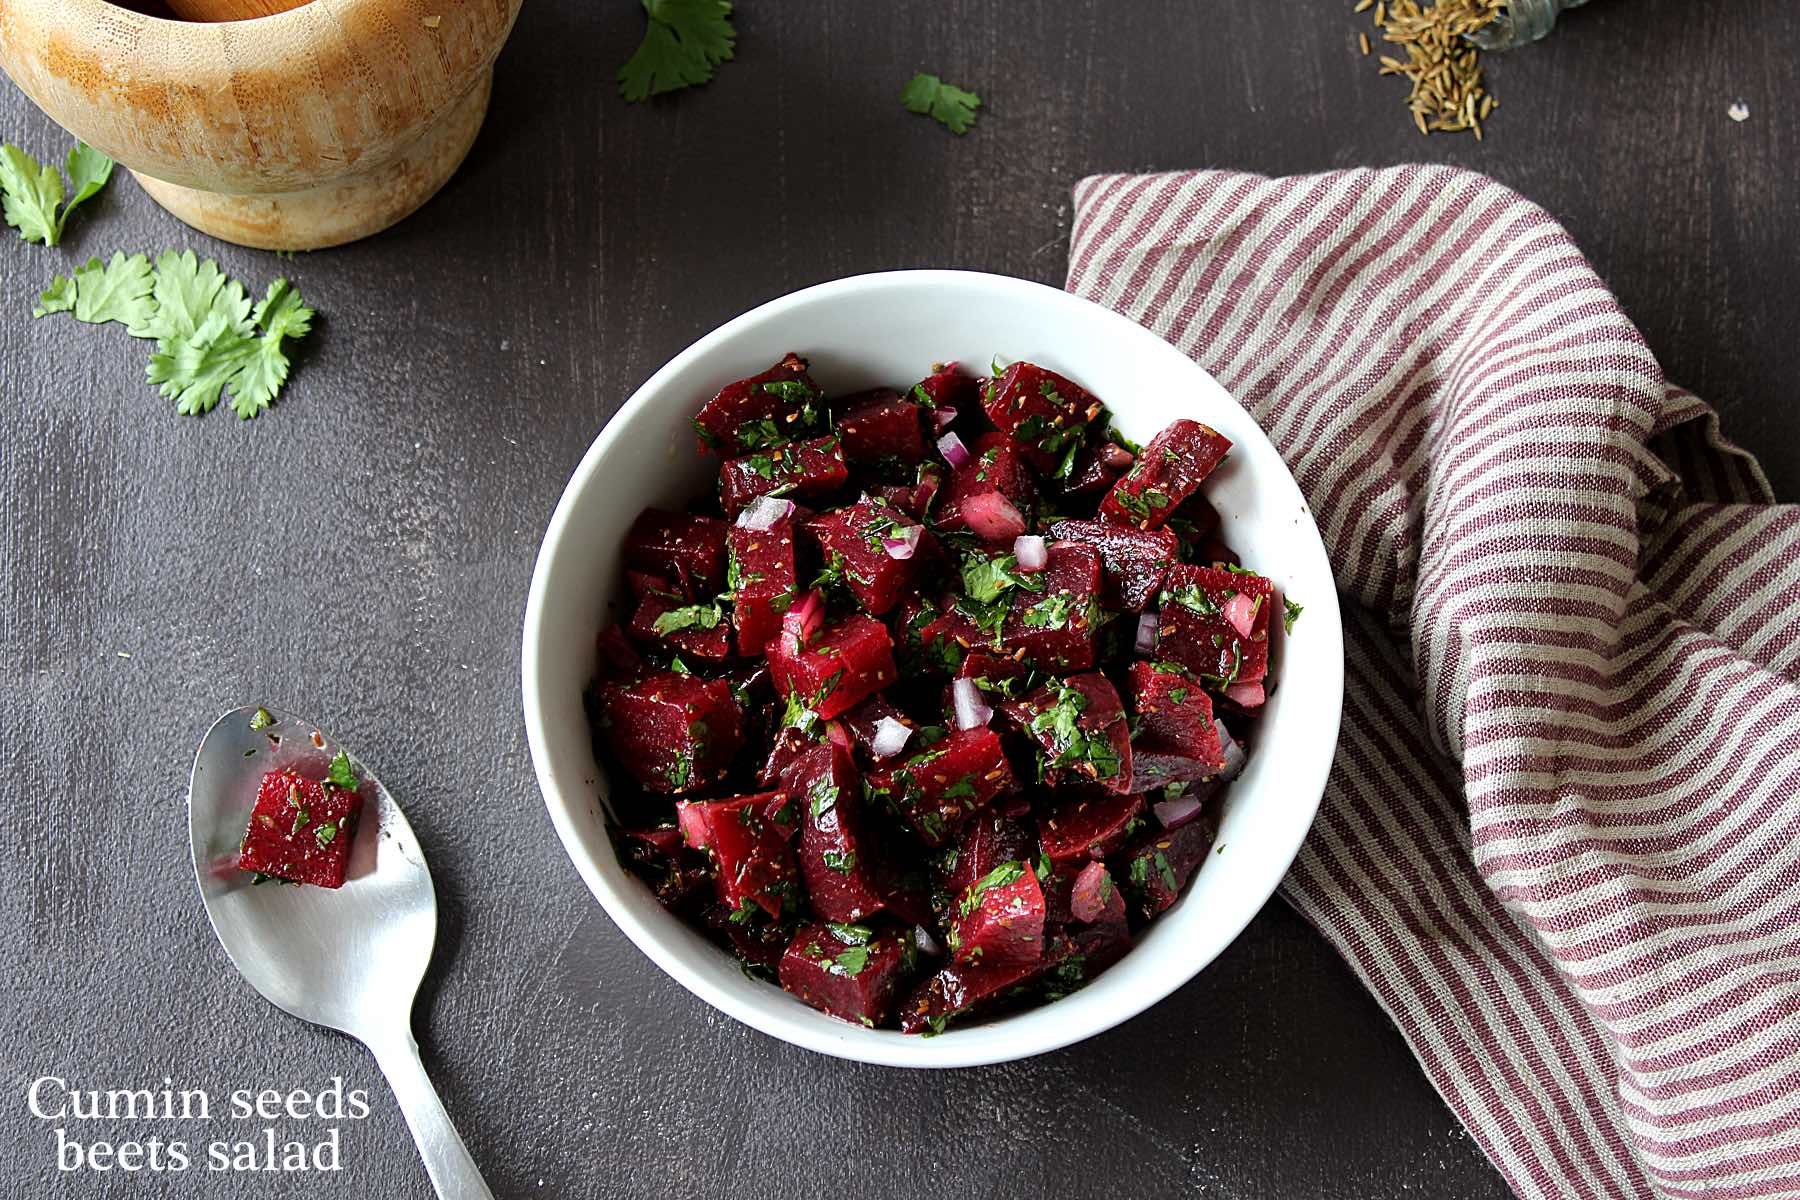 Cumin seeds beets salad